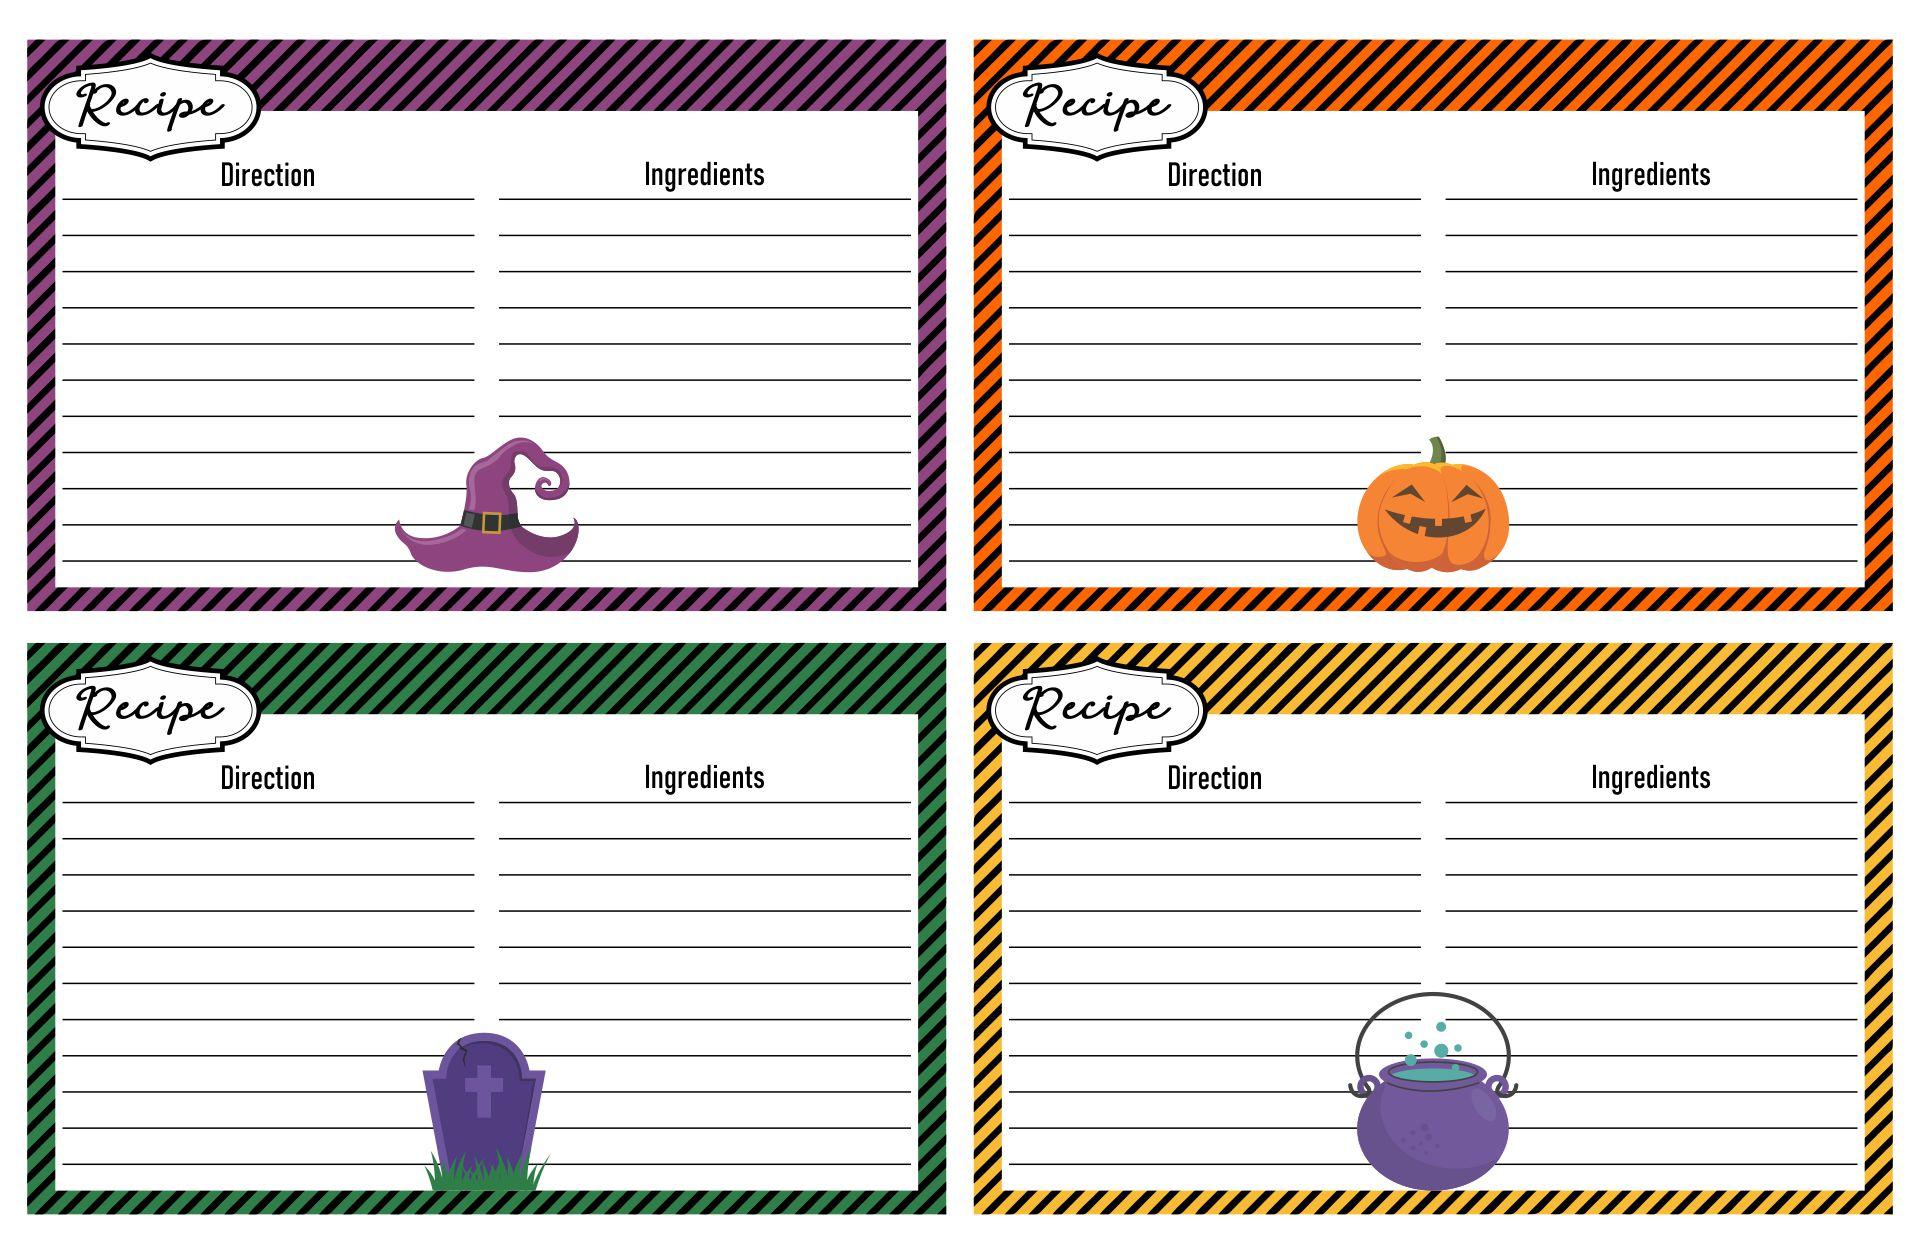 7 Images of Halloween Free Printable Menu Templates